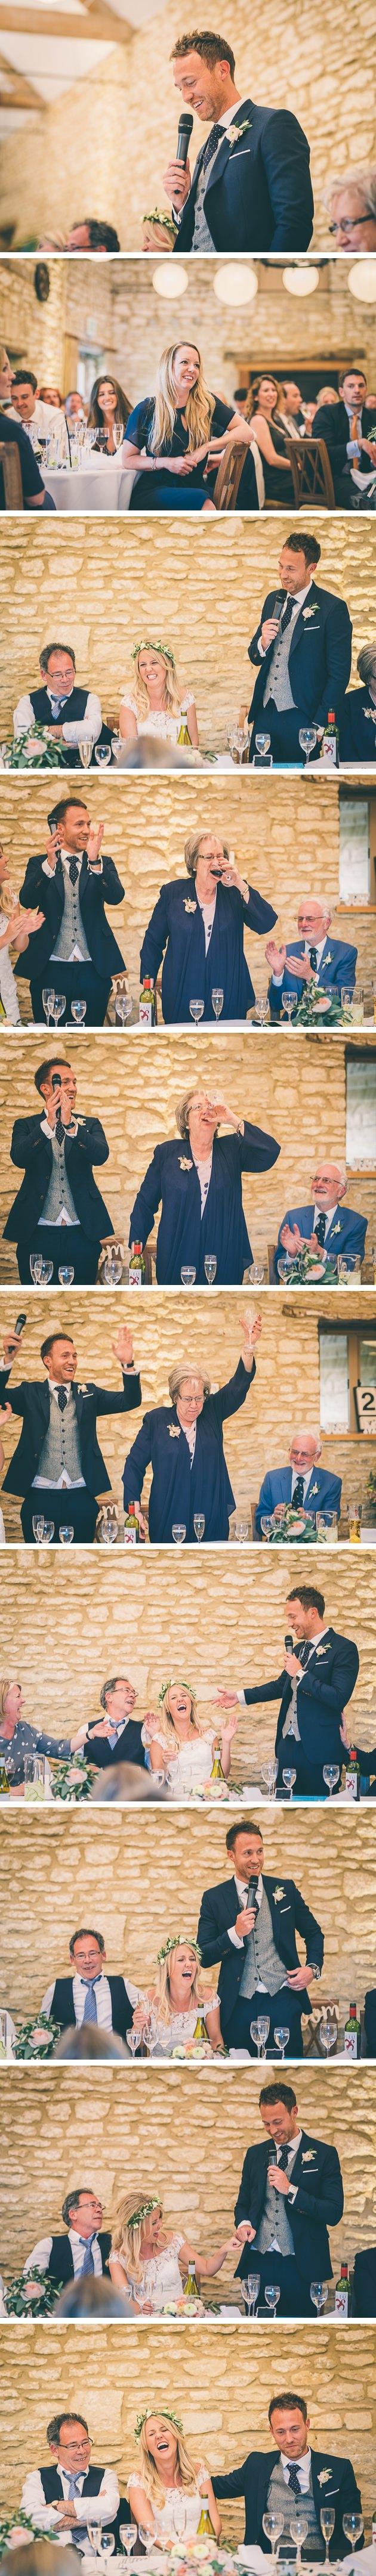 Drinking games at weddings